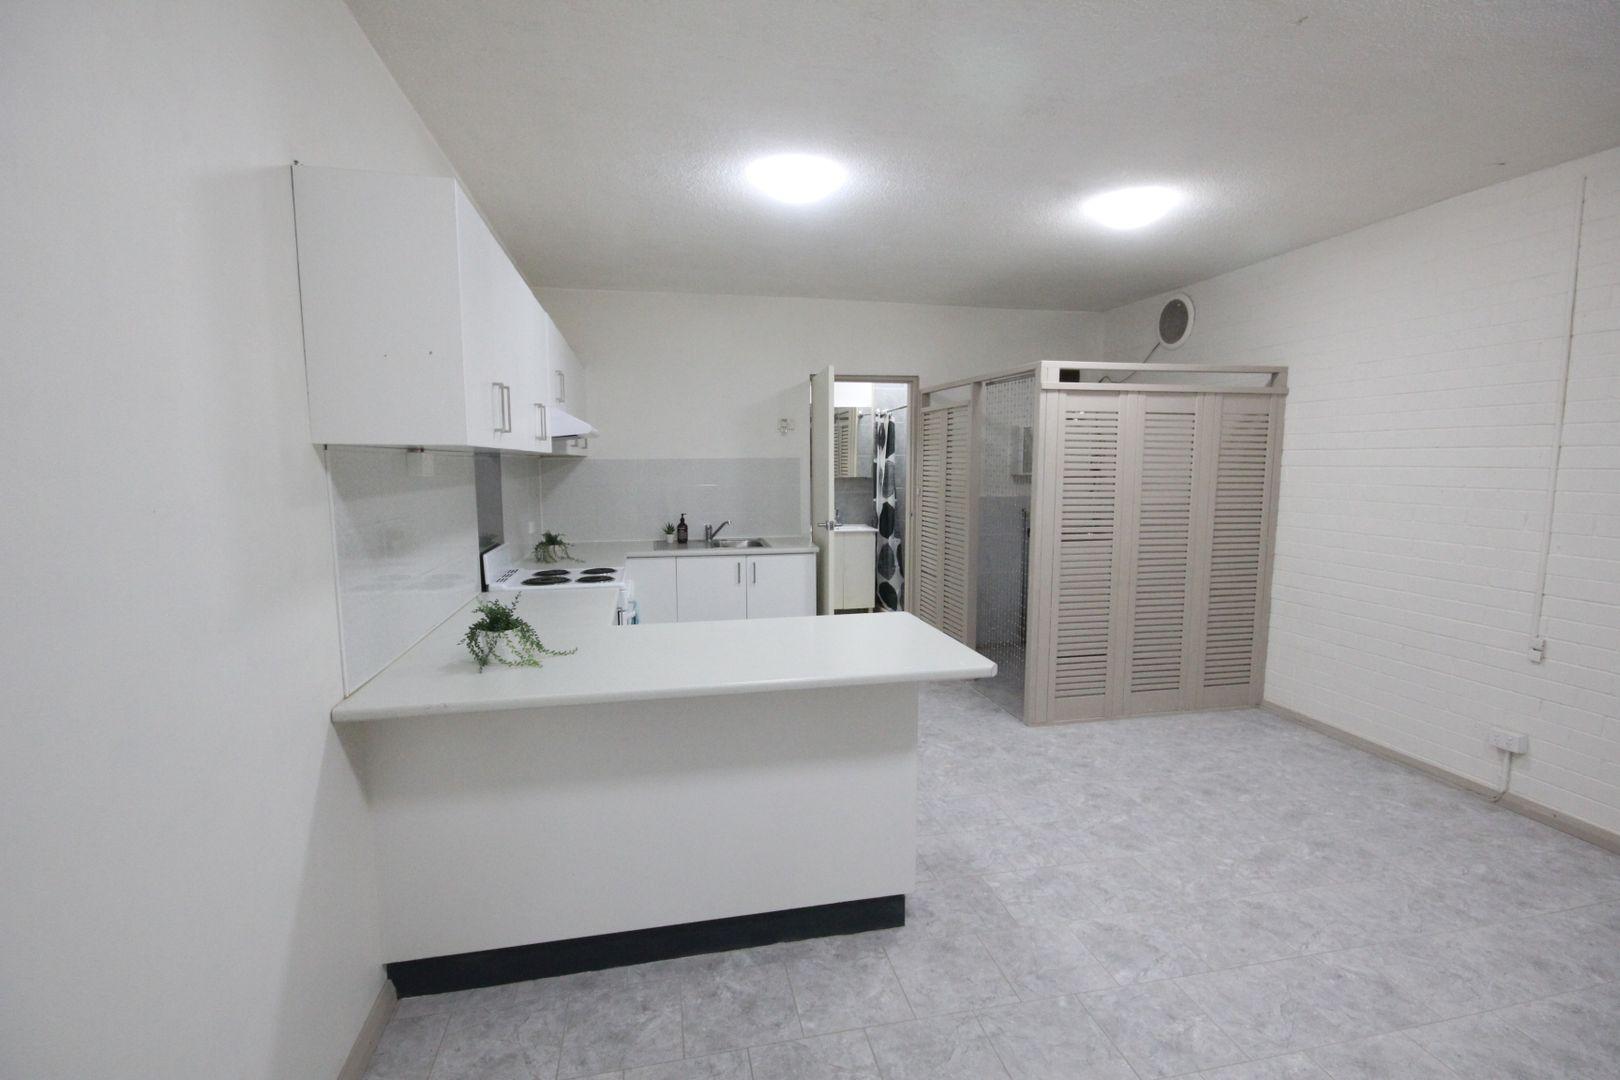 2/208 Enmore Road, Enmore NSW 2042, Image 1